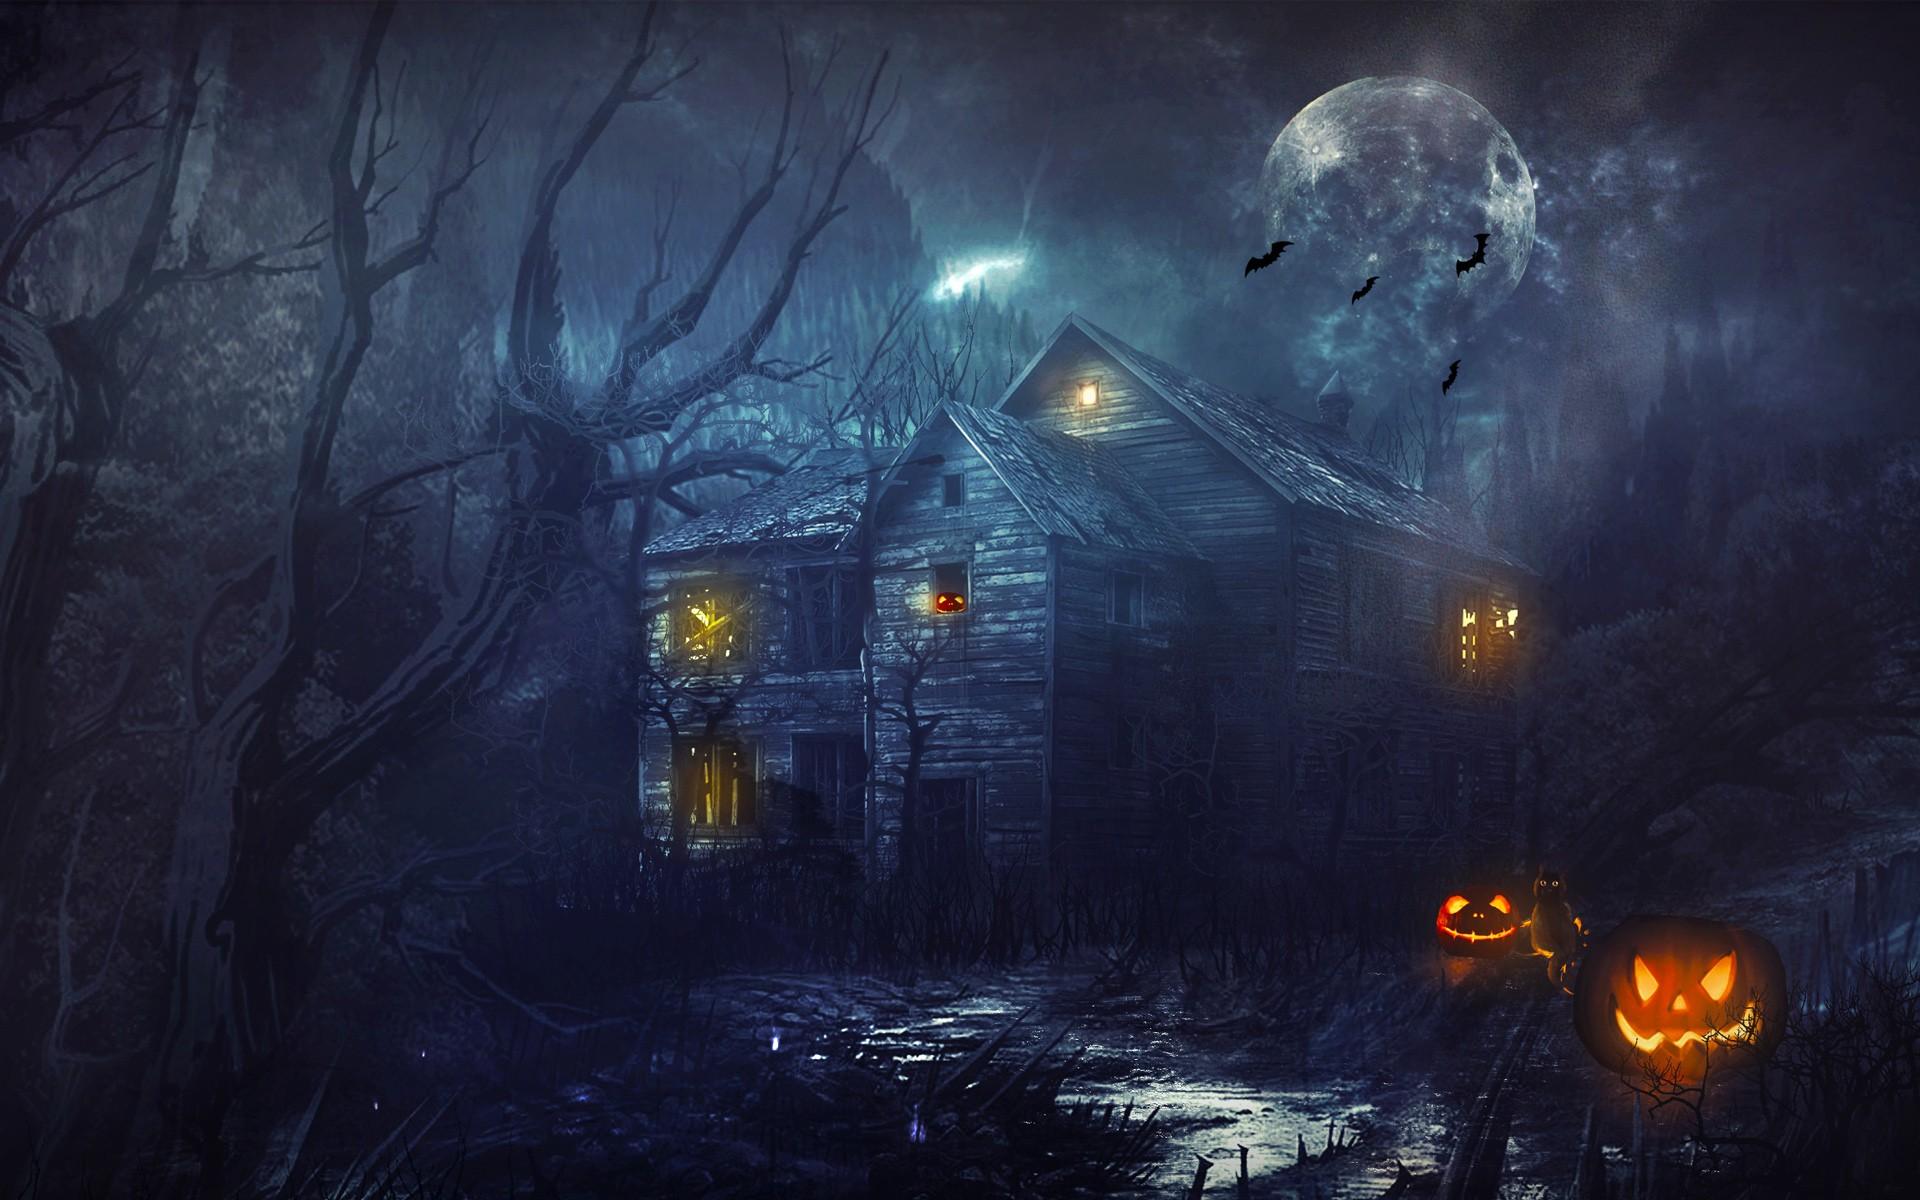 Halloween desktop wallpaper ·① Download free awesome full HD ...